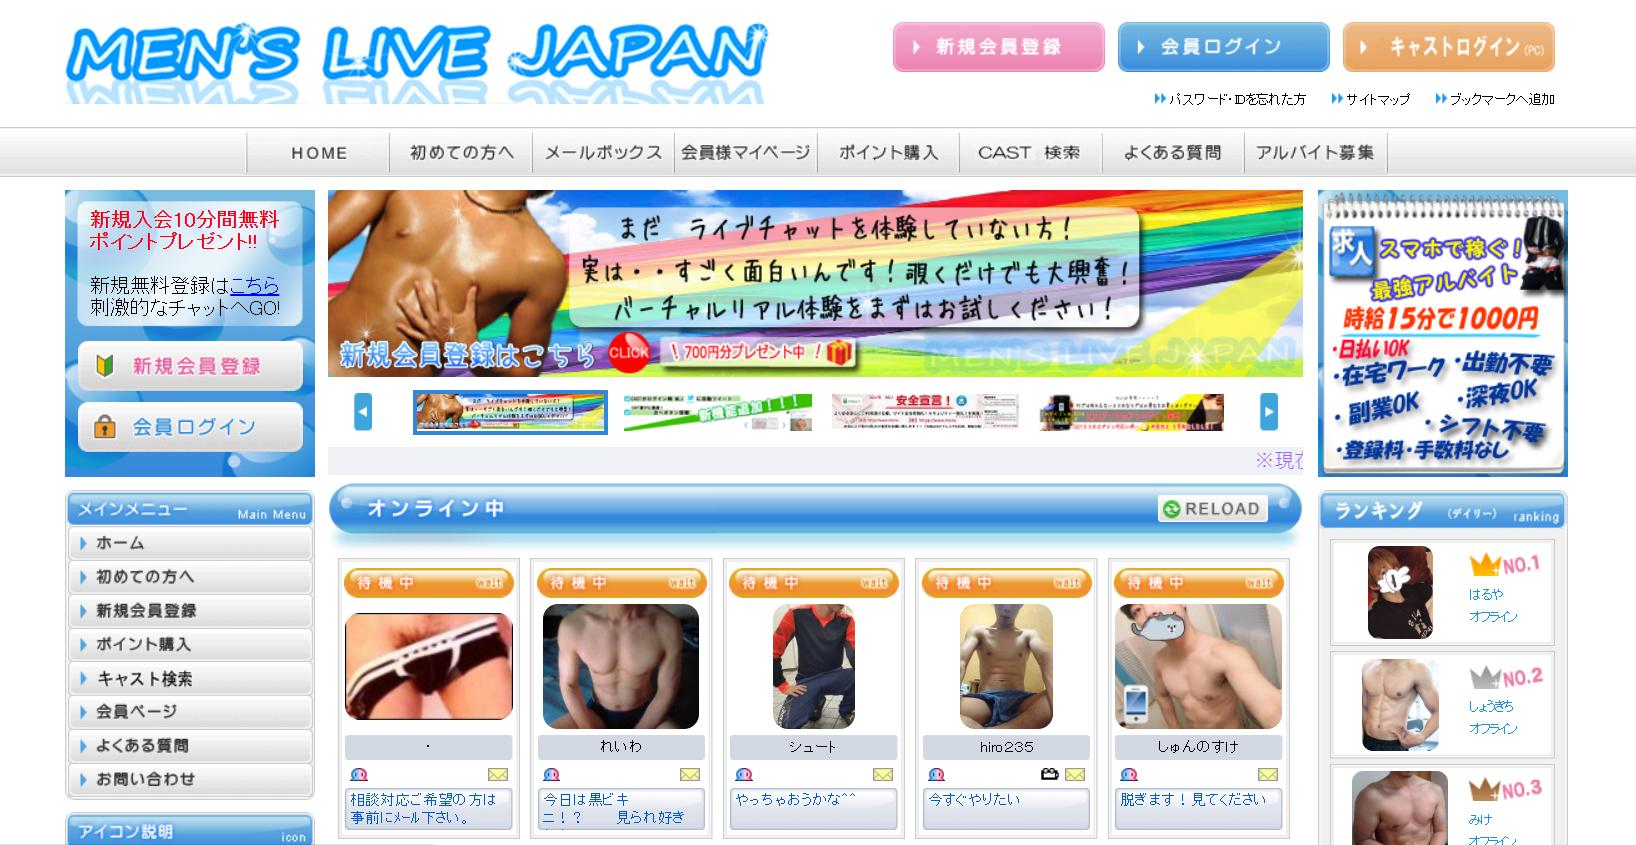 MEN'S LIVE JAPAN